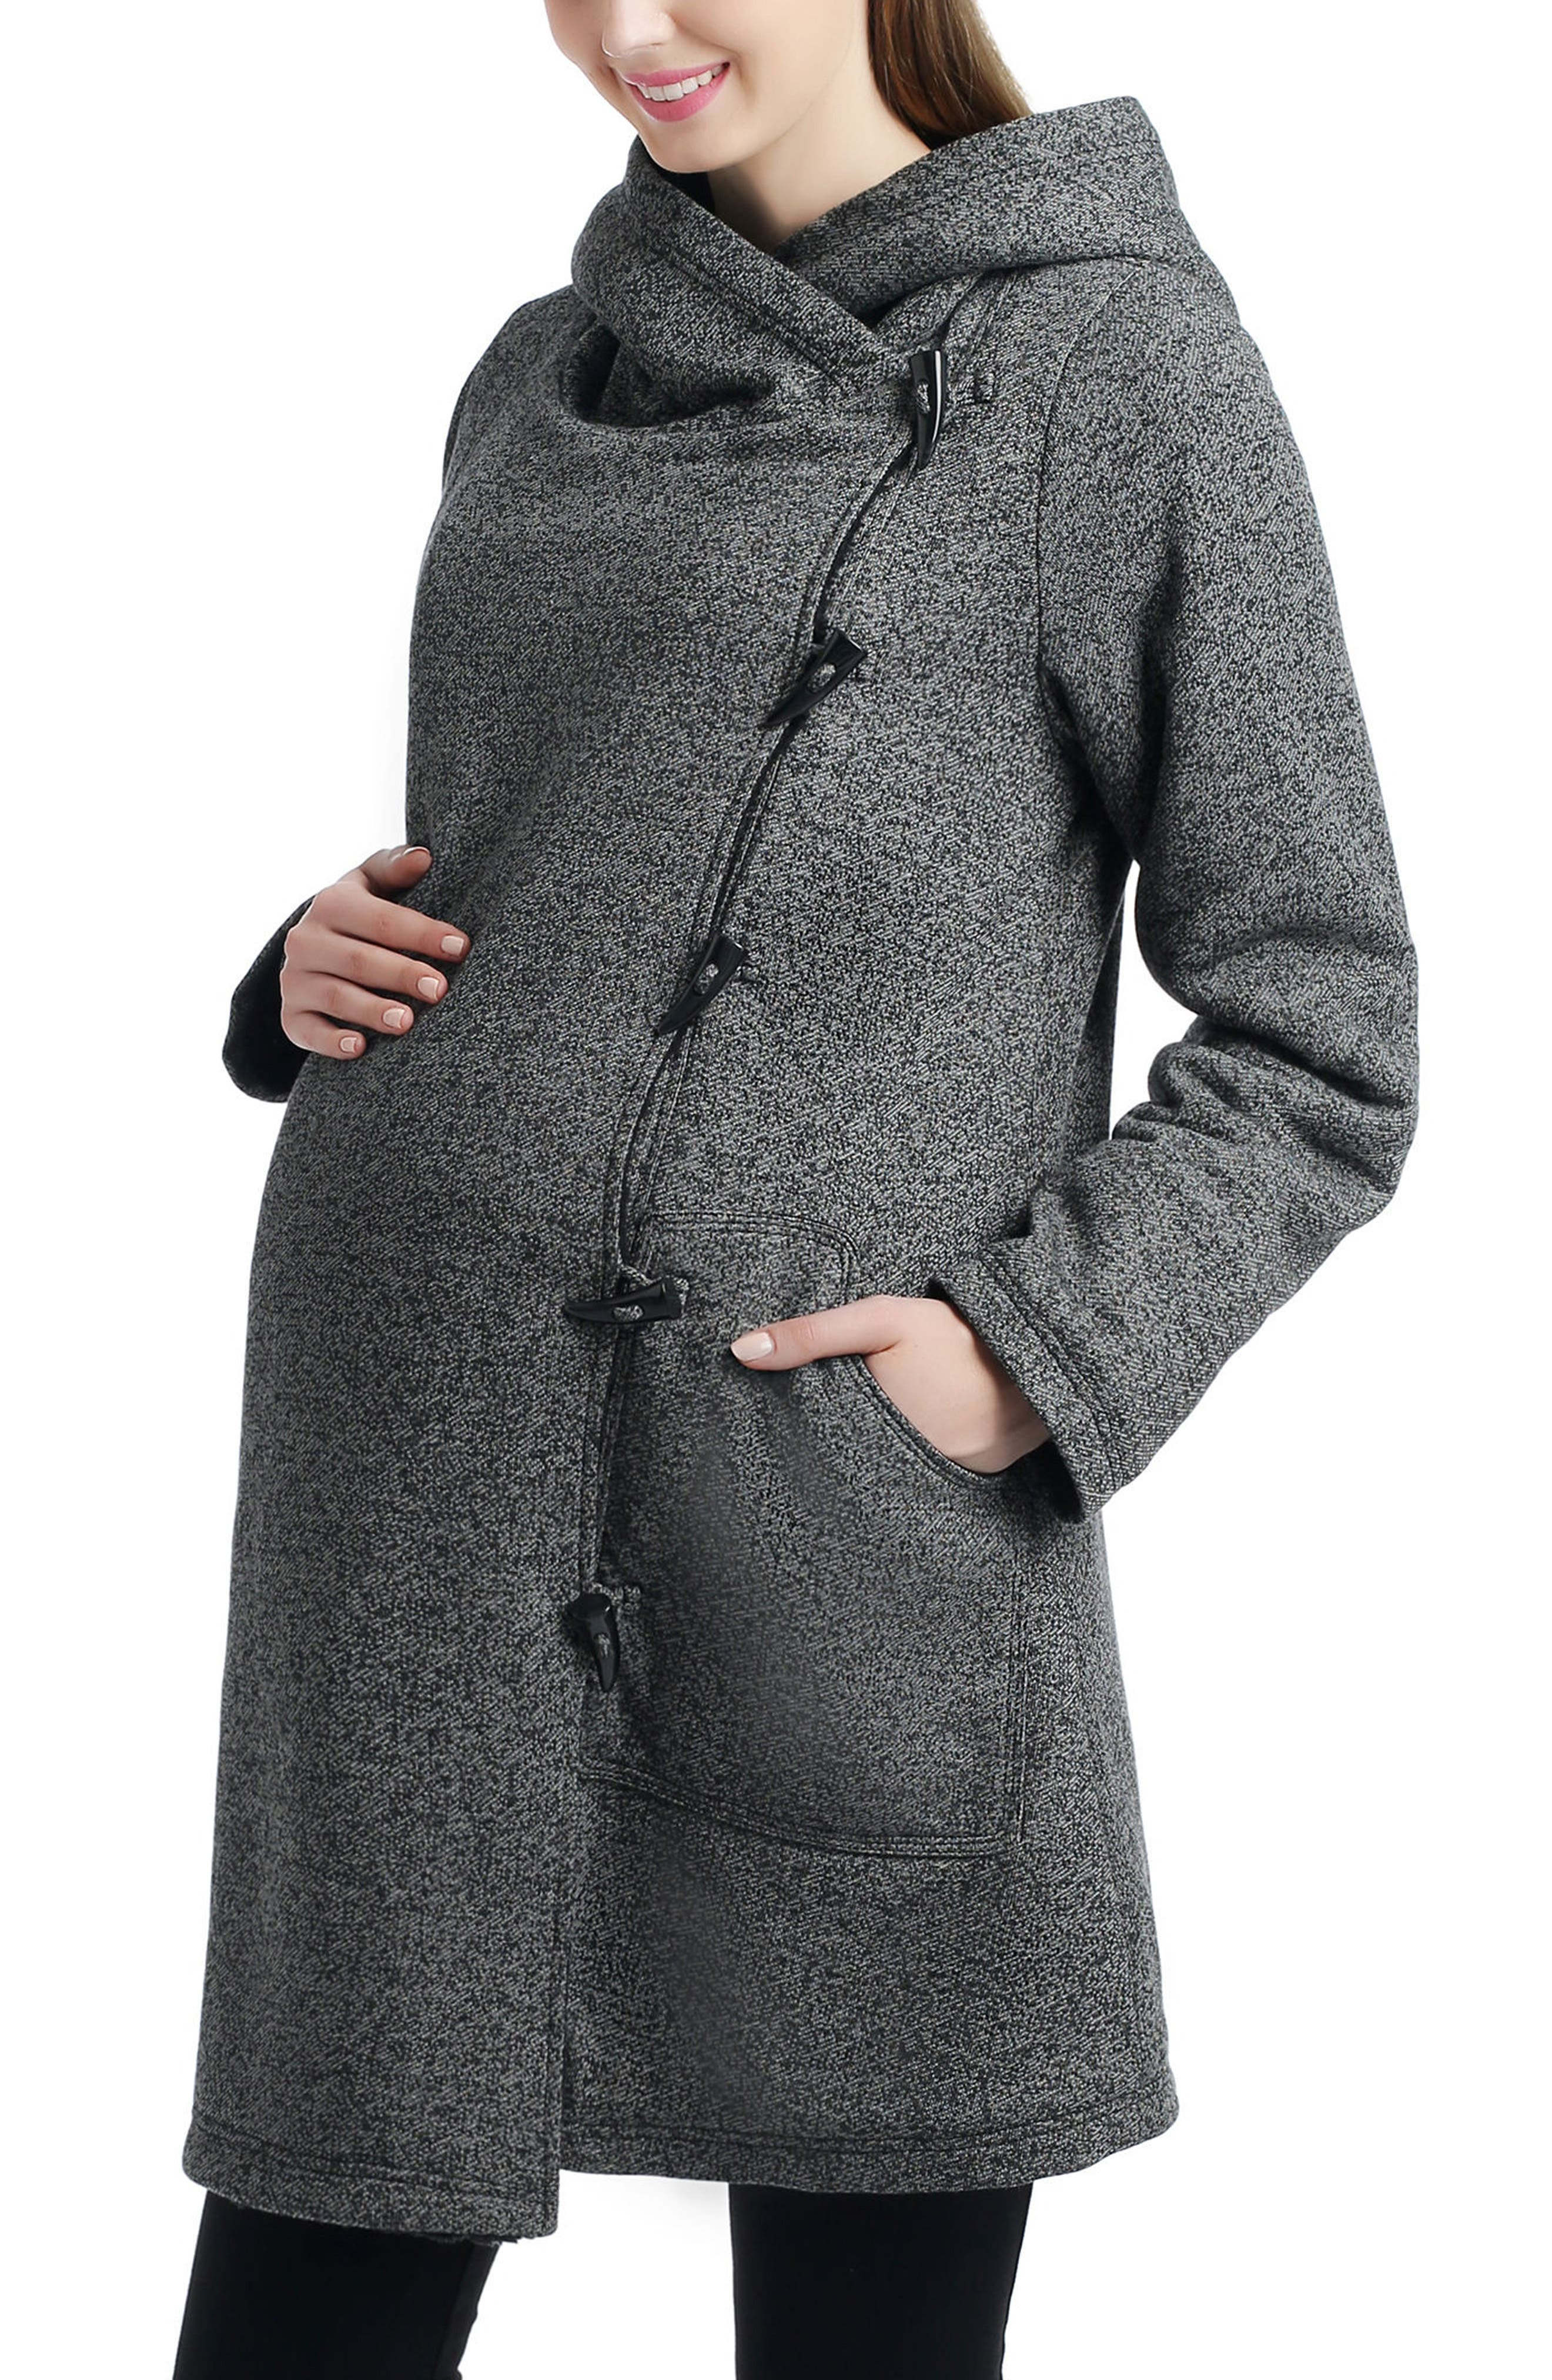 Alternate Image 1 Selected - Kimi and Kai Amy Hooded Maternity Sweatshirt Jacket